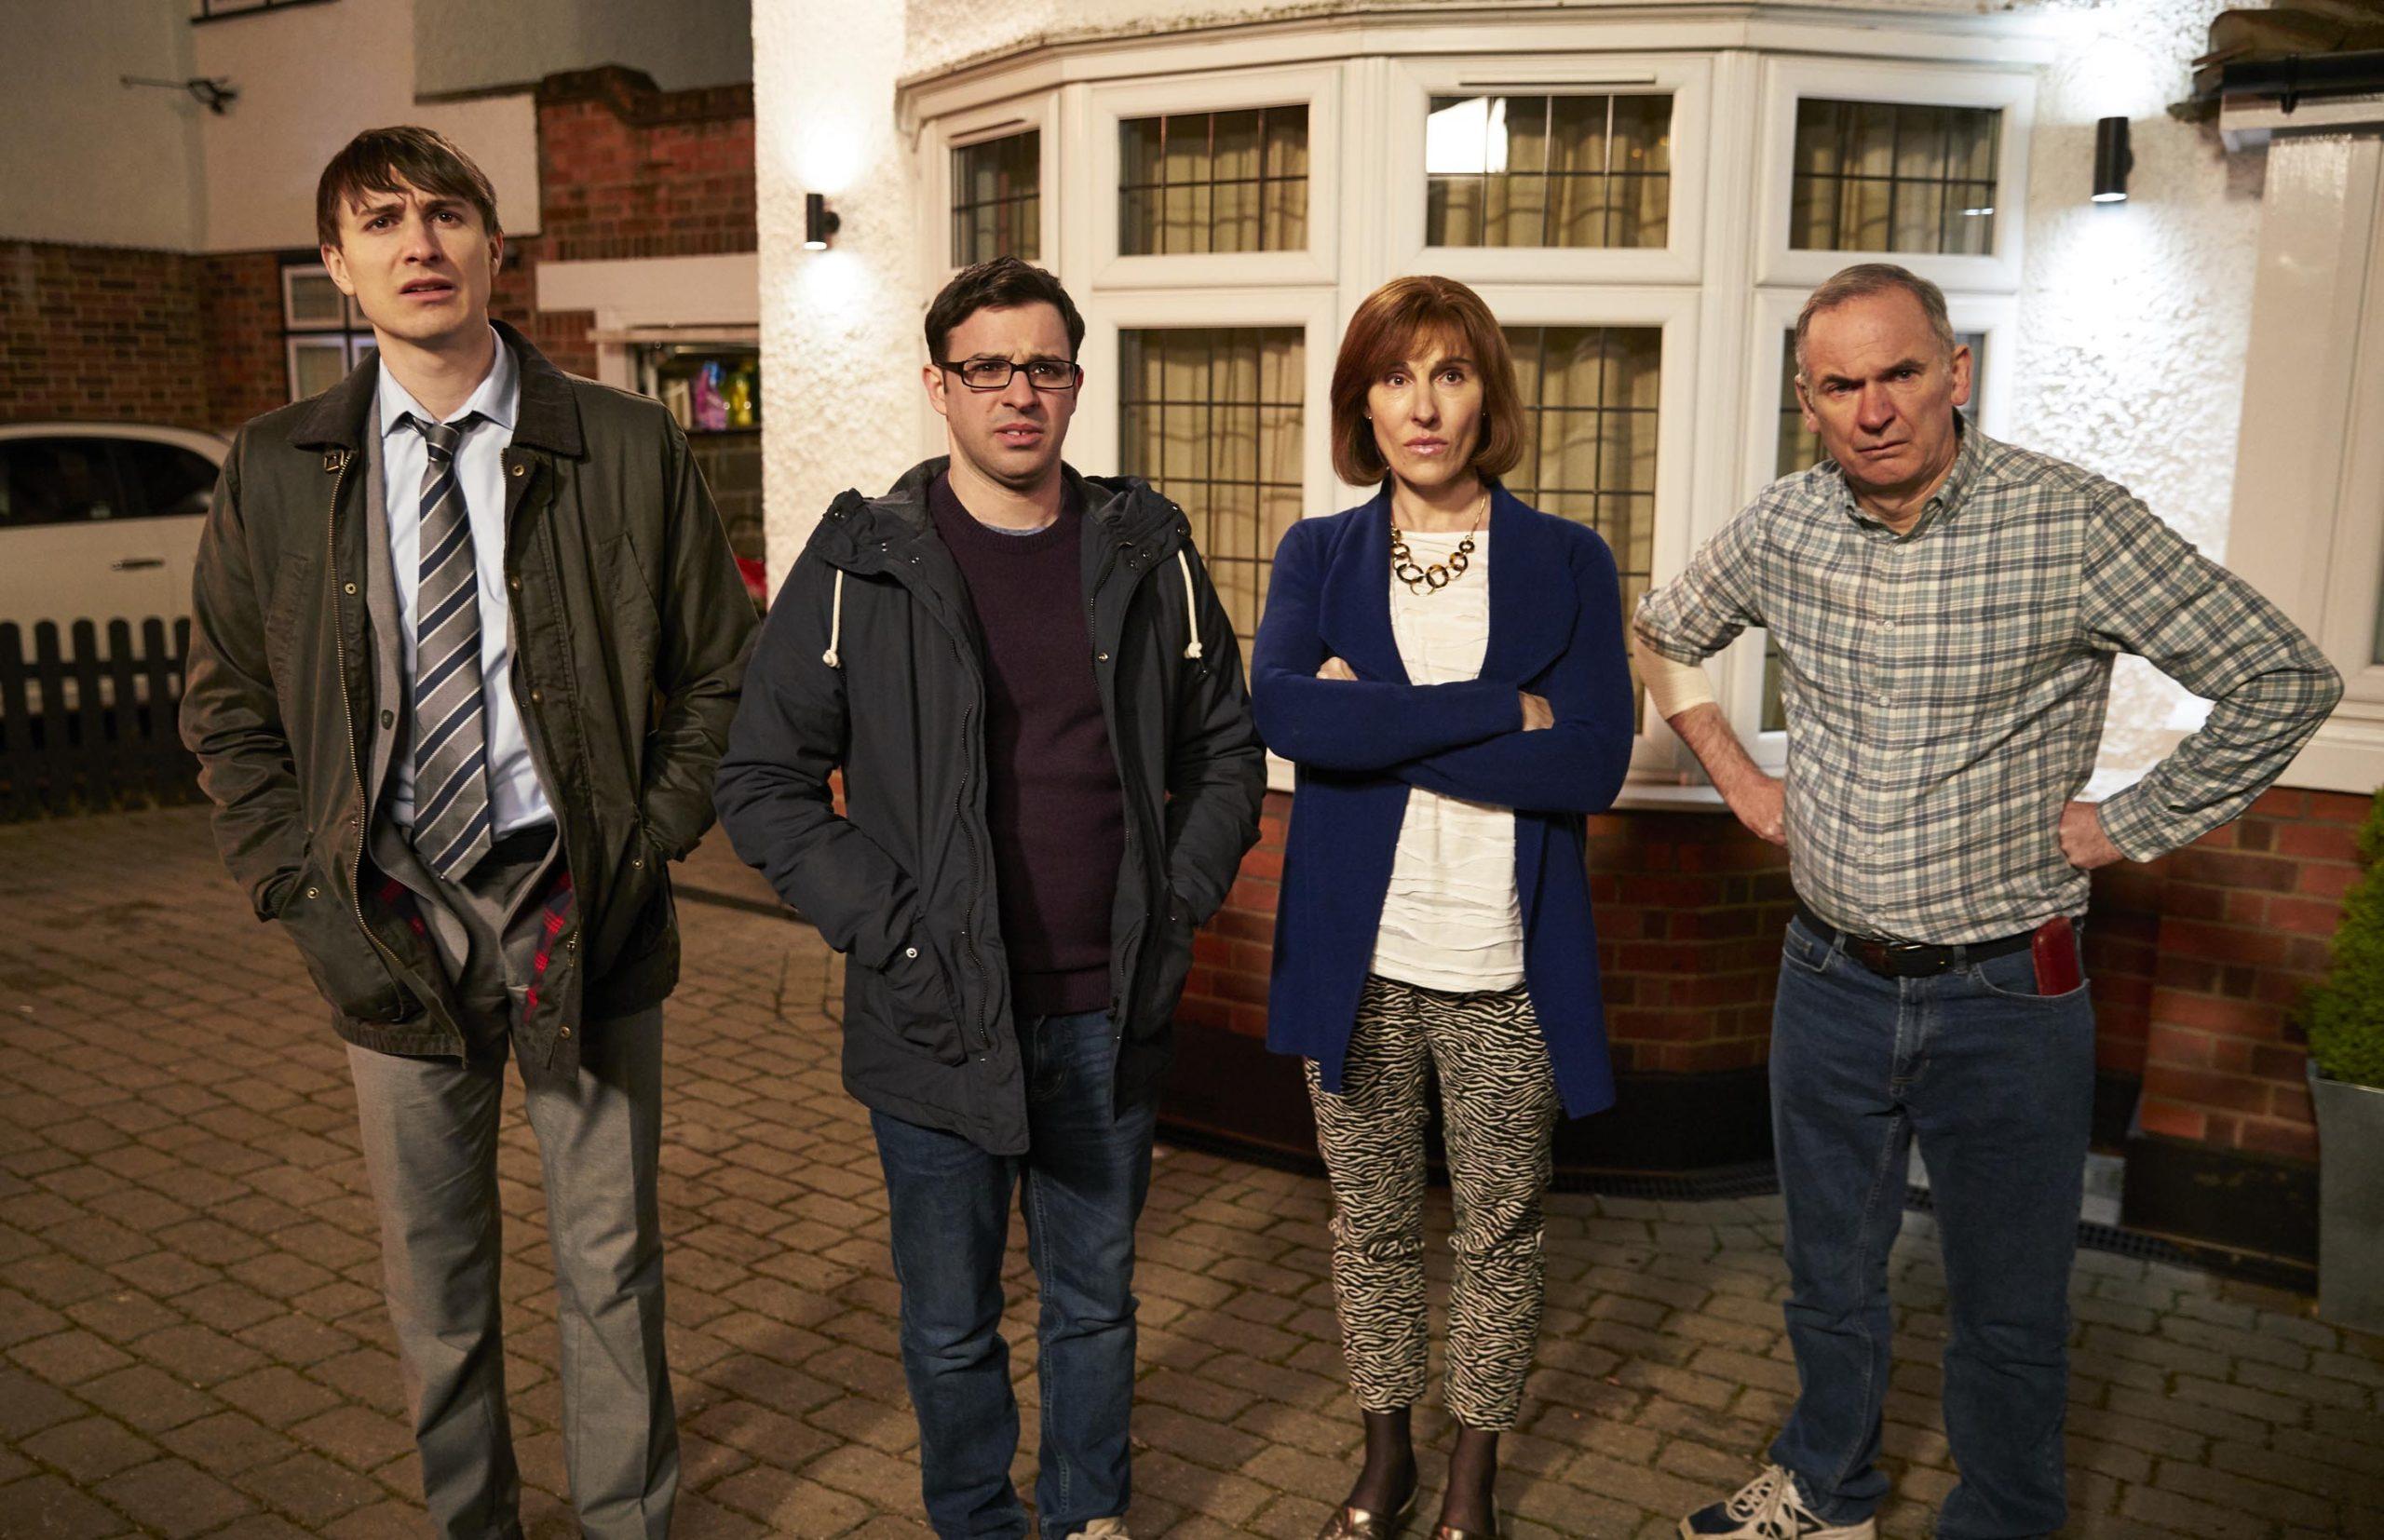 Friday Night Dinner season 6 - Start date, cast, plot and ...